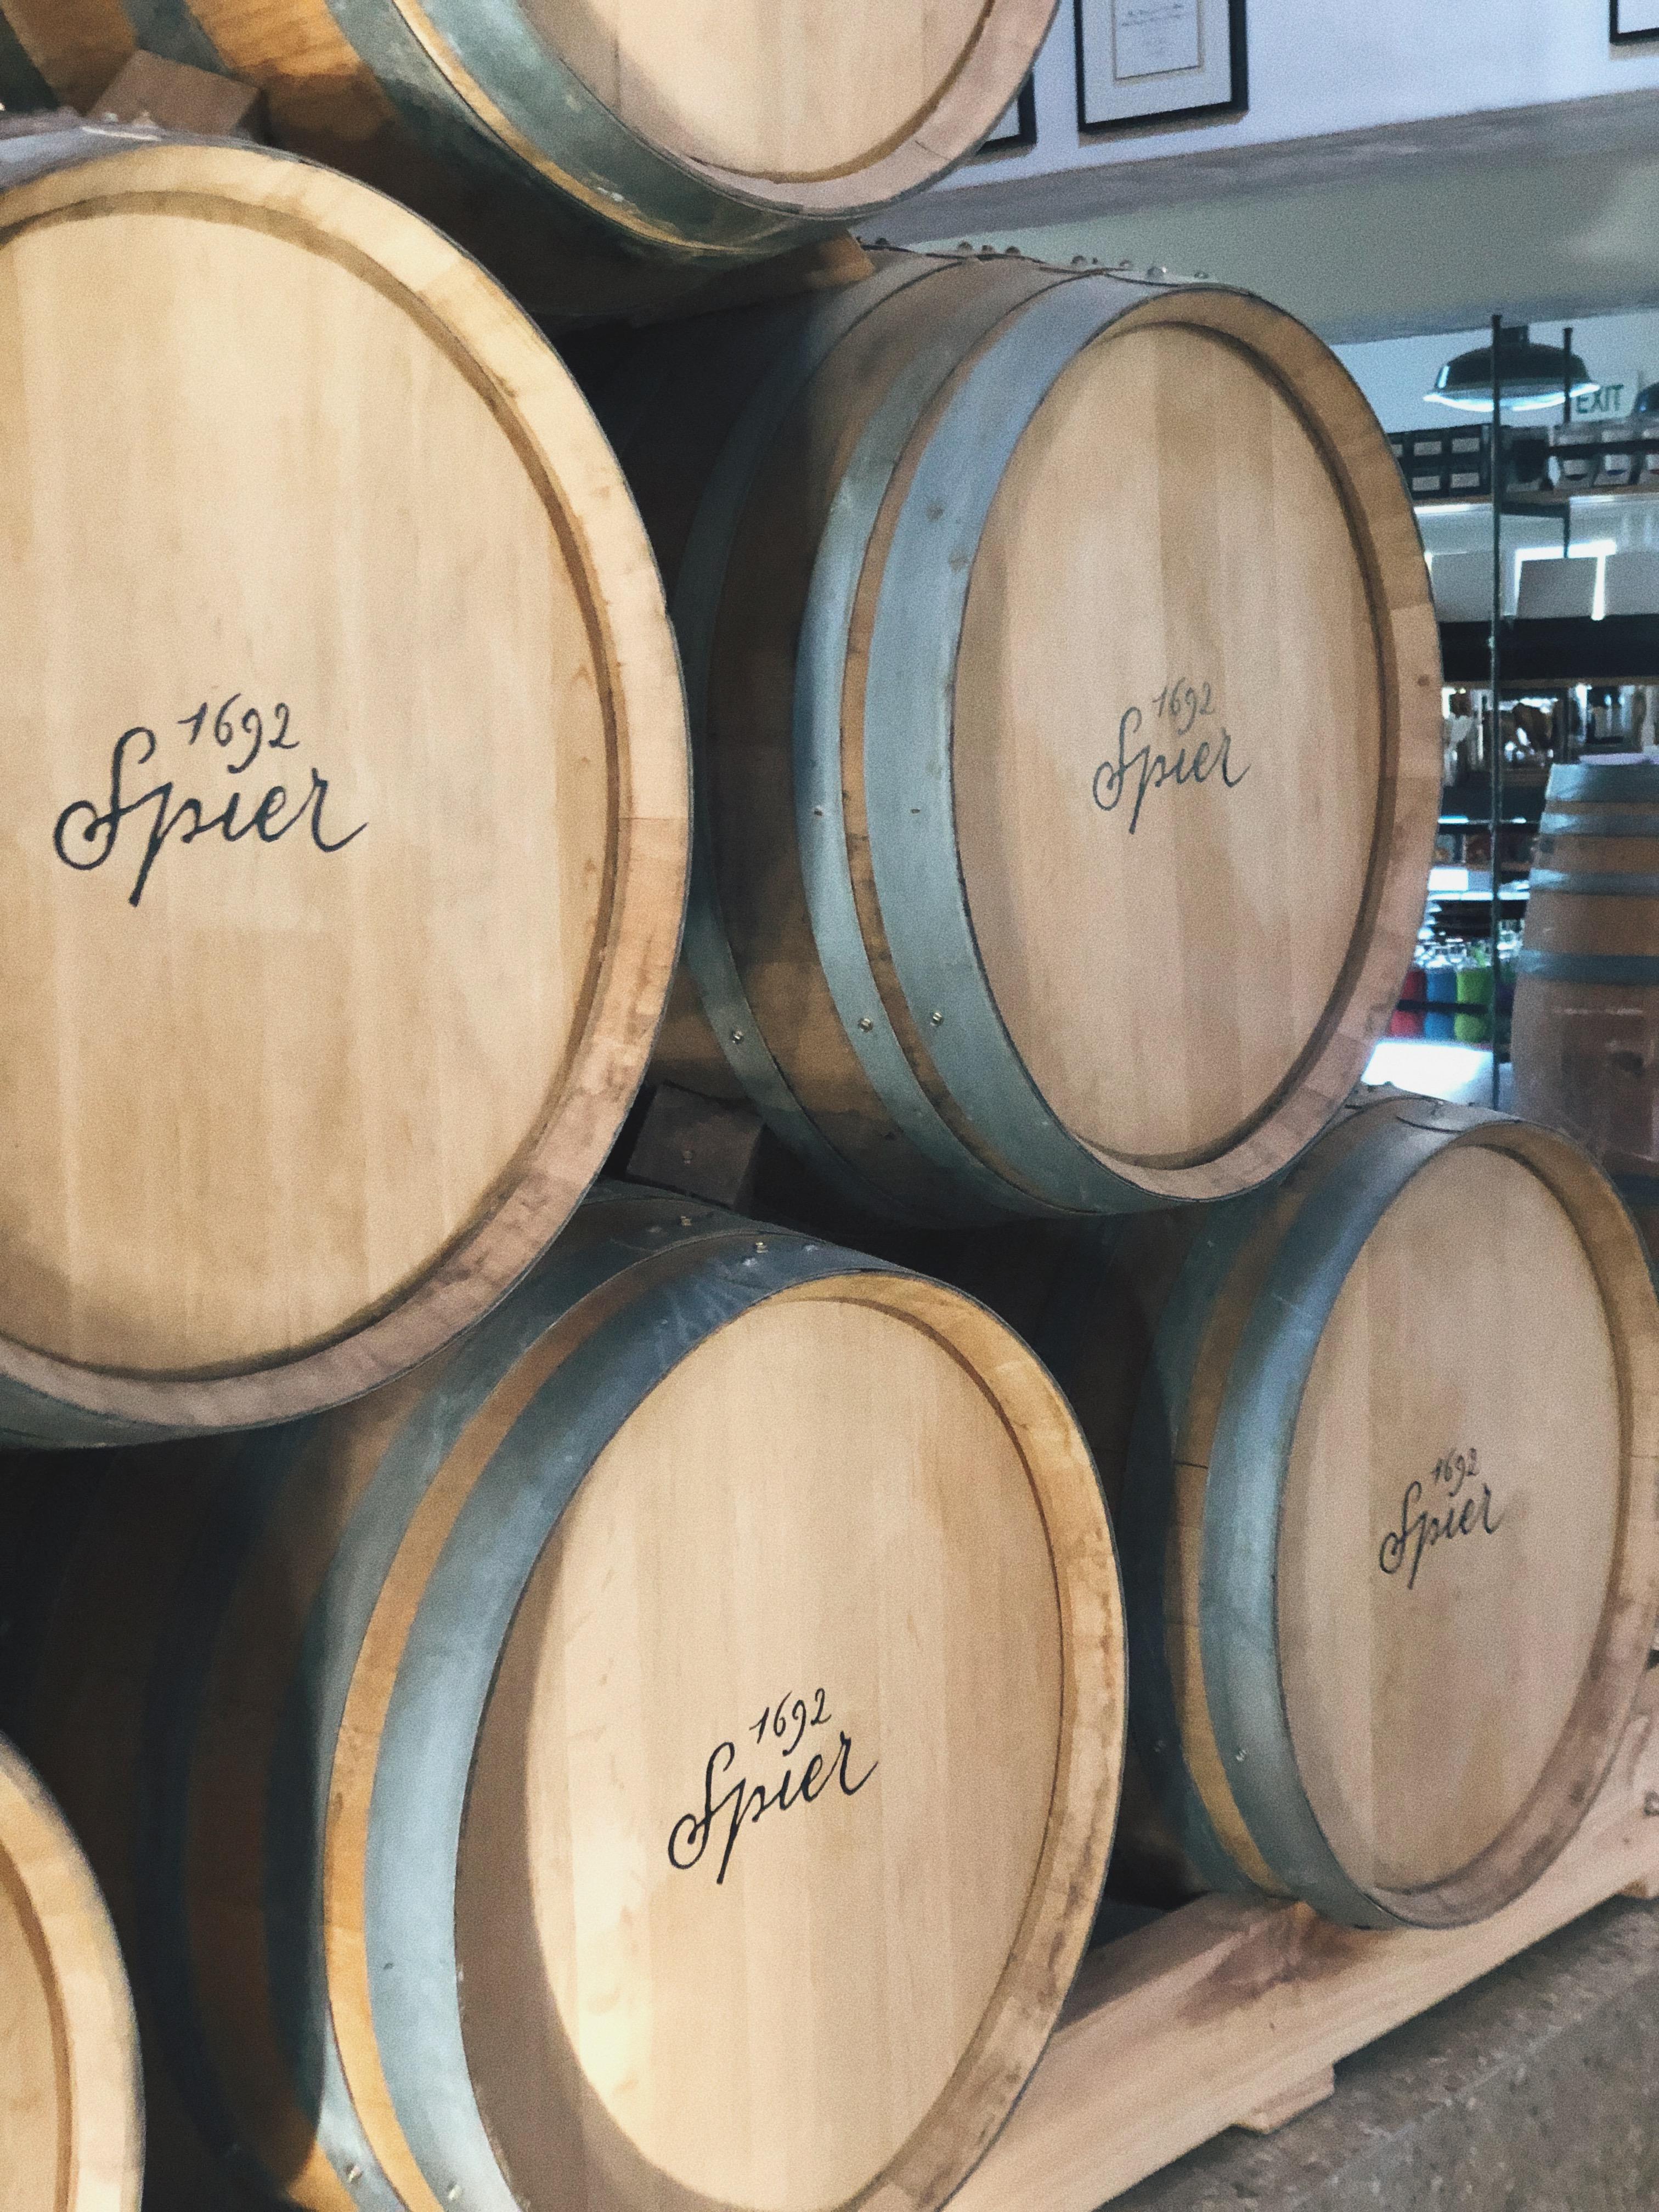 Spier wine estate wine barrels